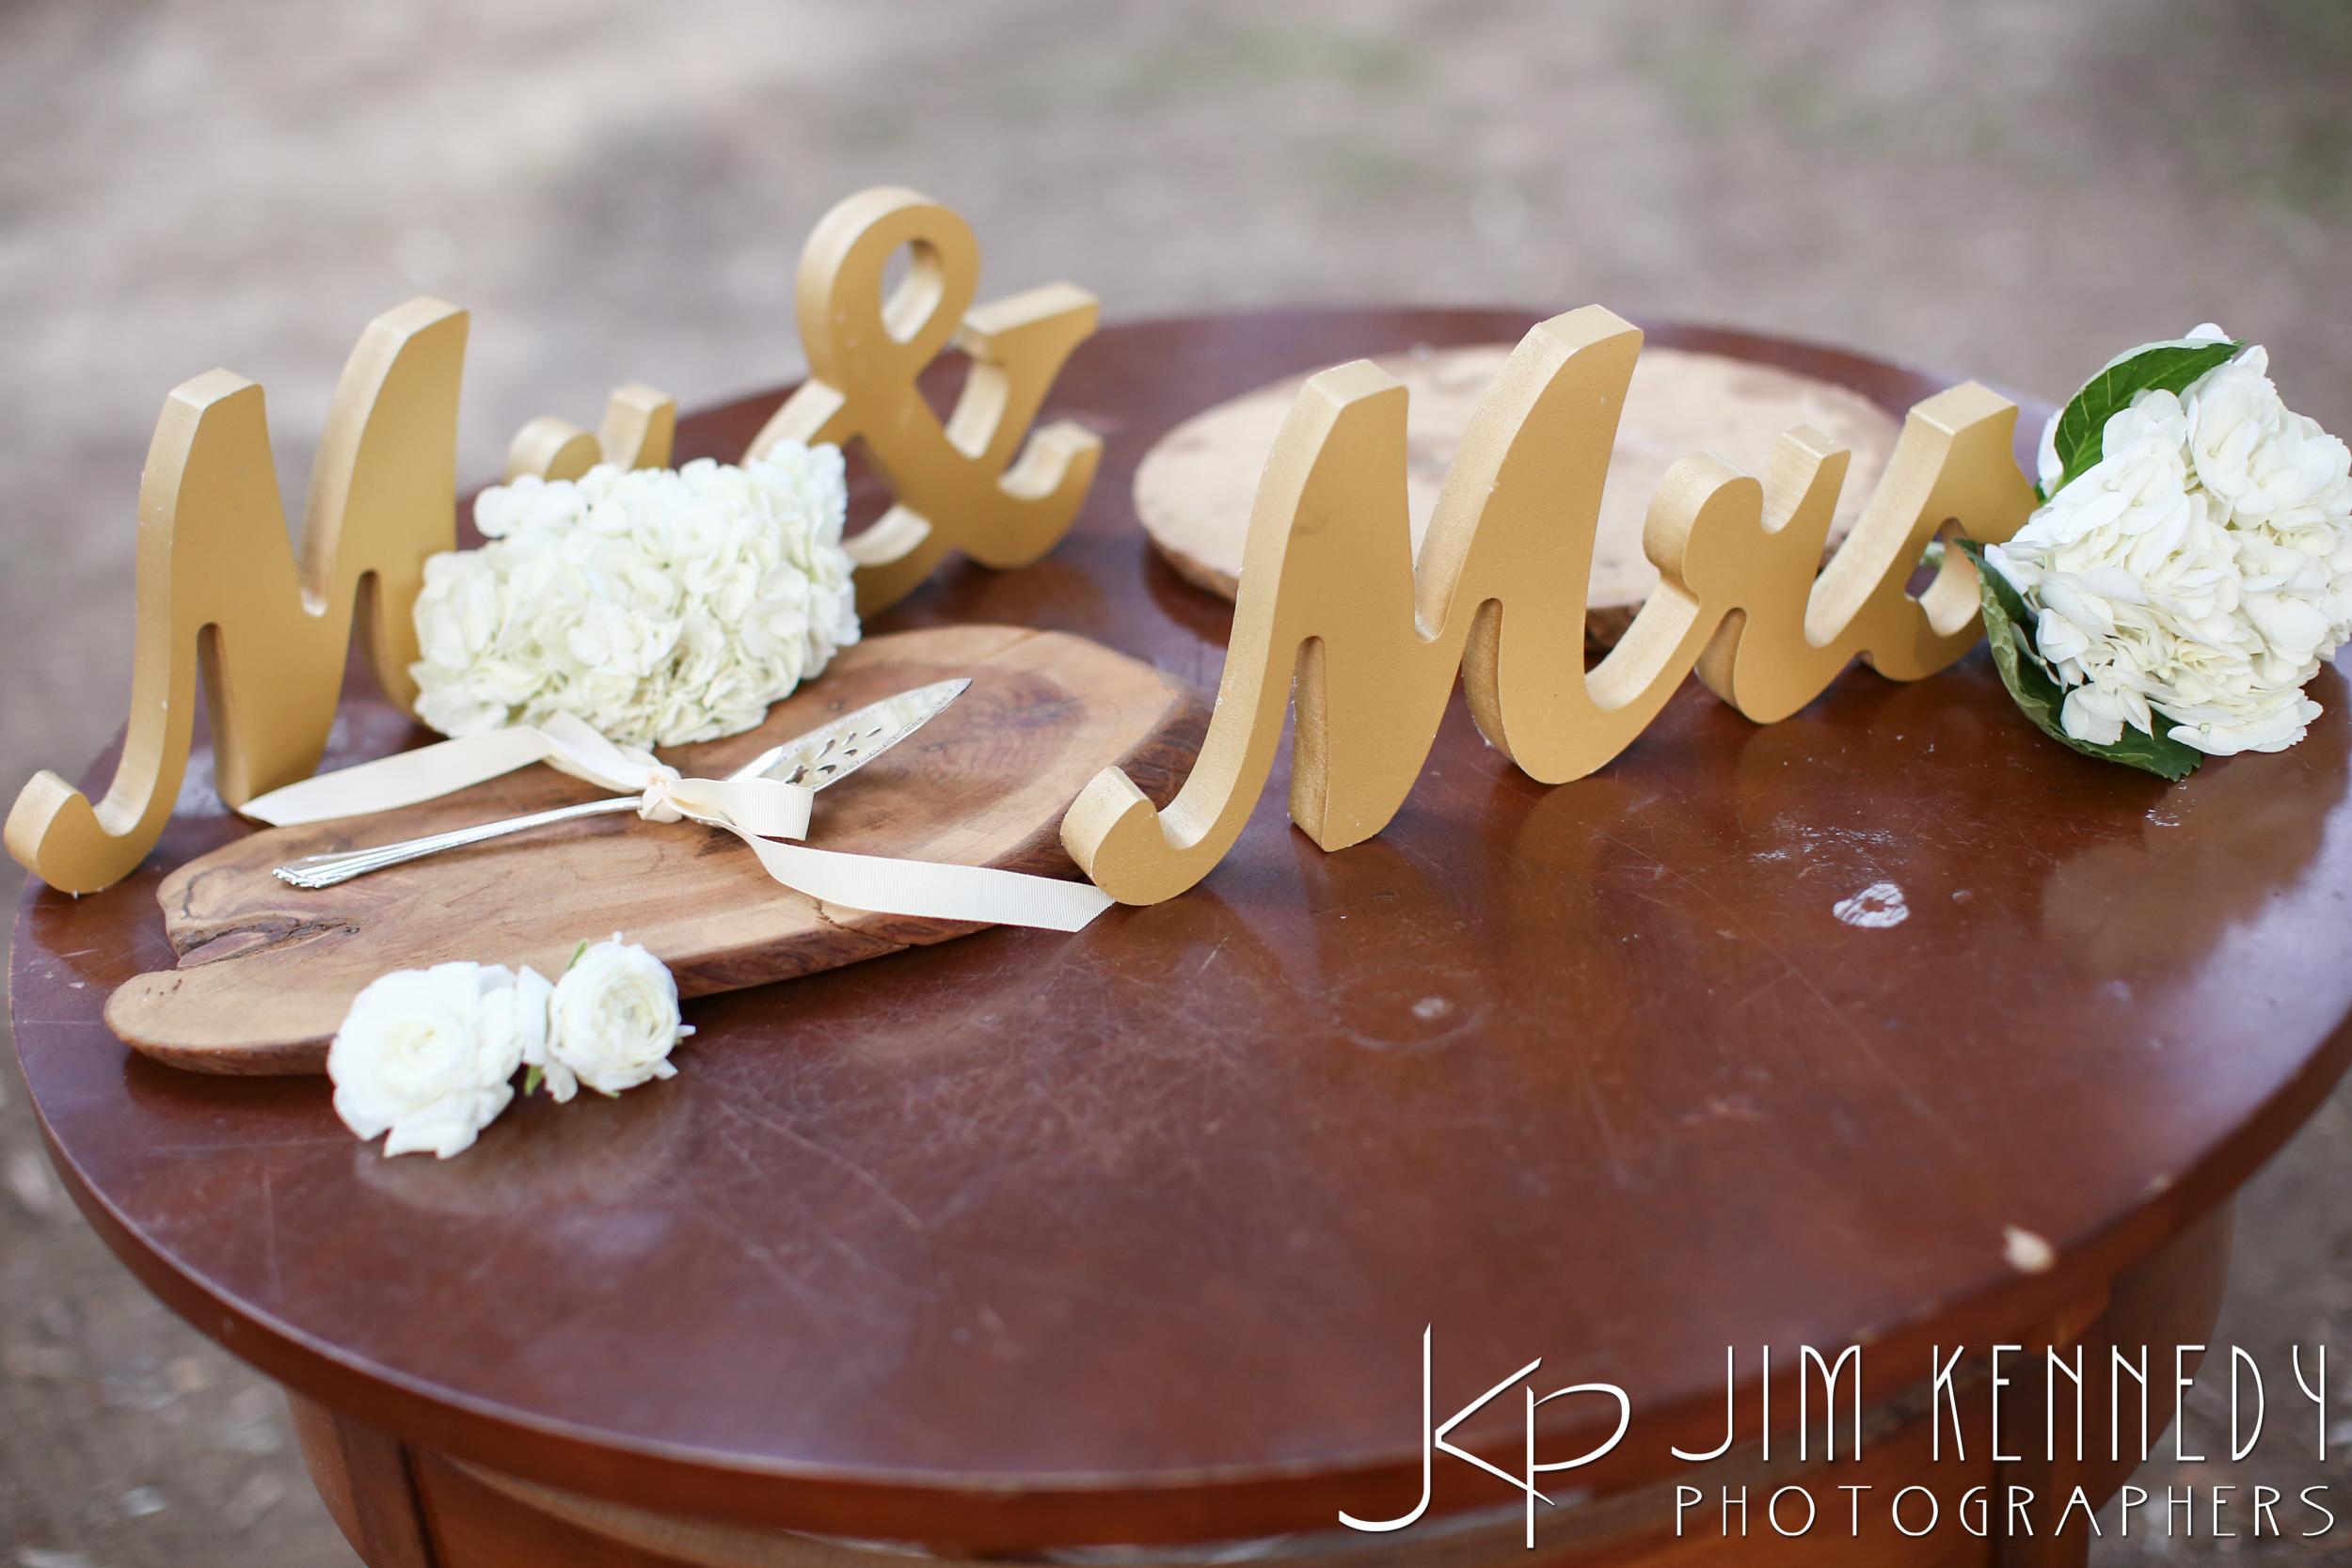 jim_kennedy_photographers_highland_springs_wedding_caitlyn_0097.jpg